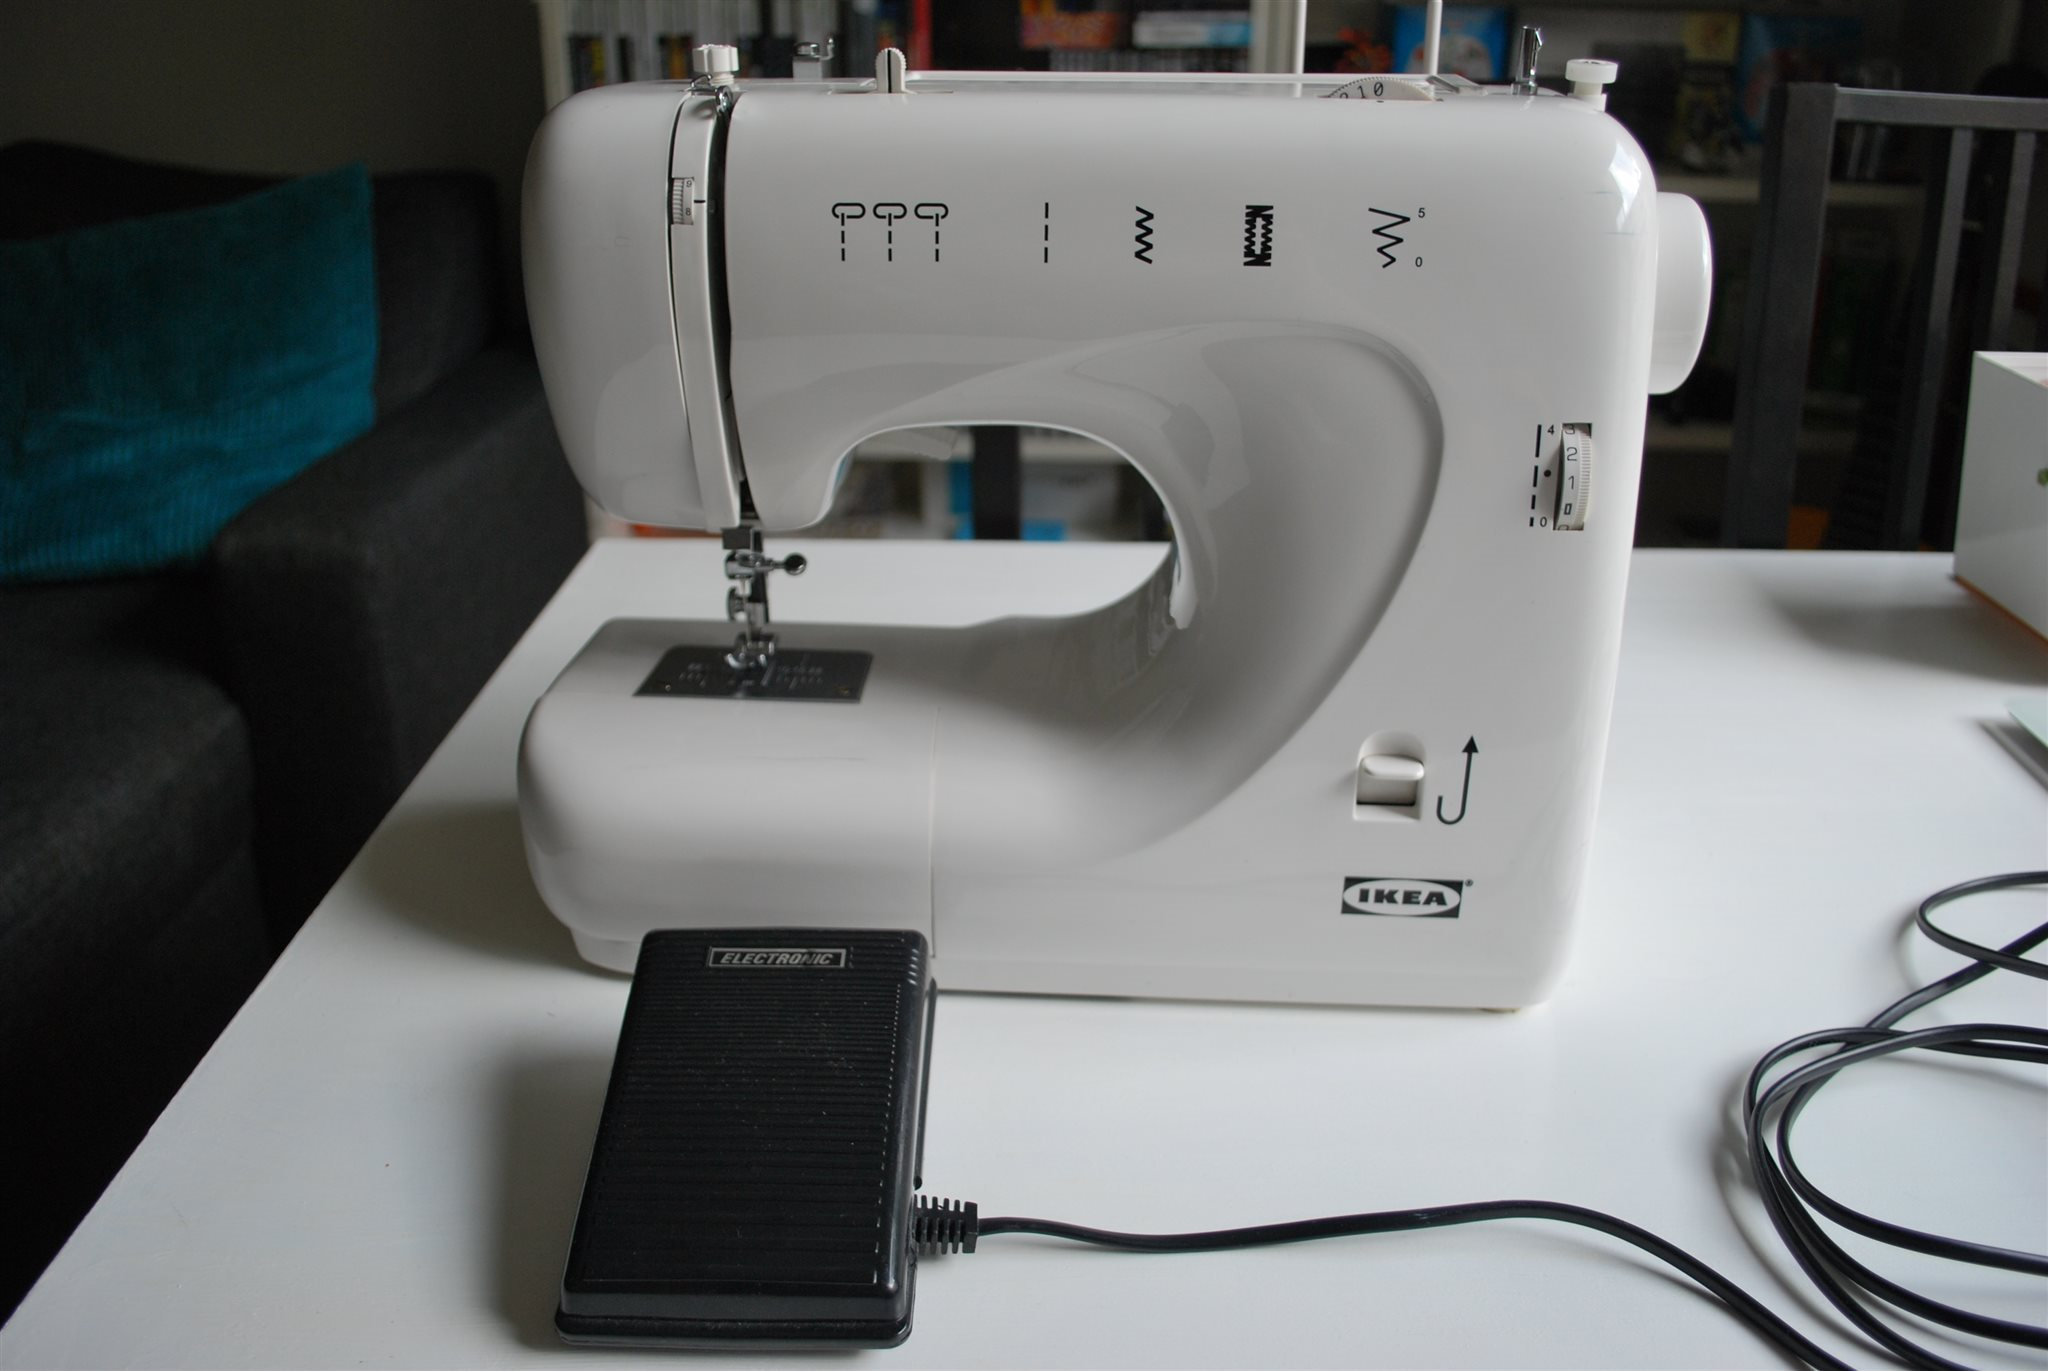 tråden trasslar sig i symaskinen